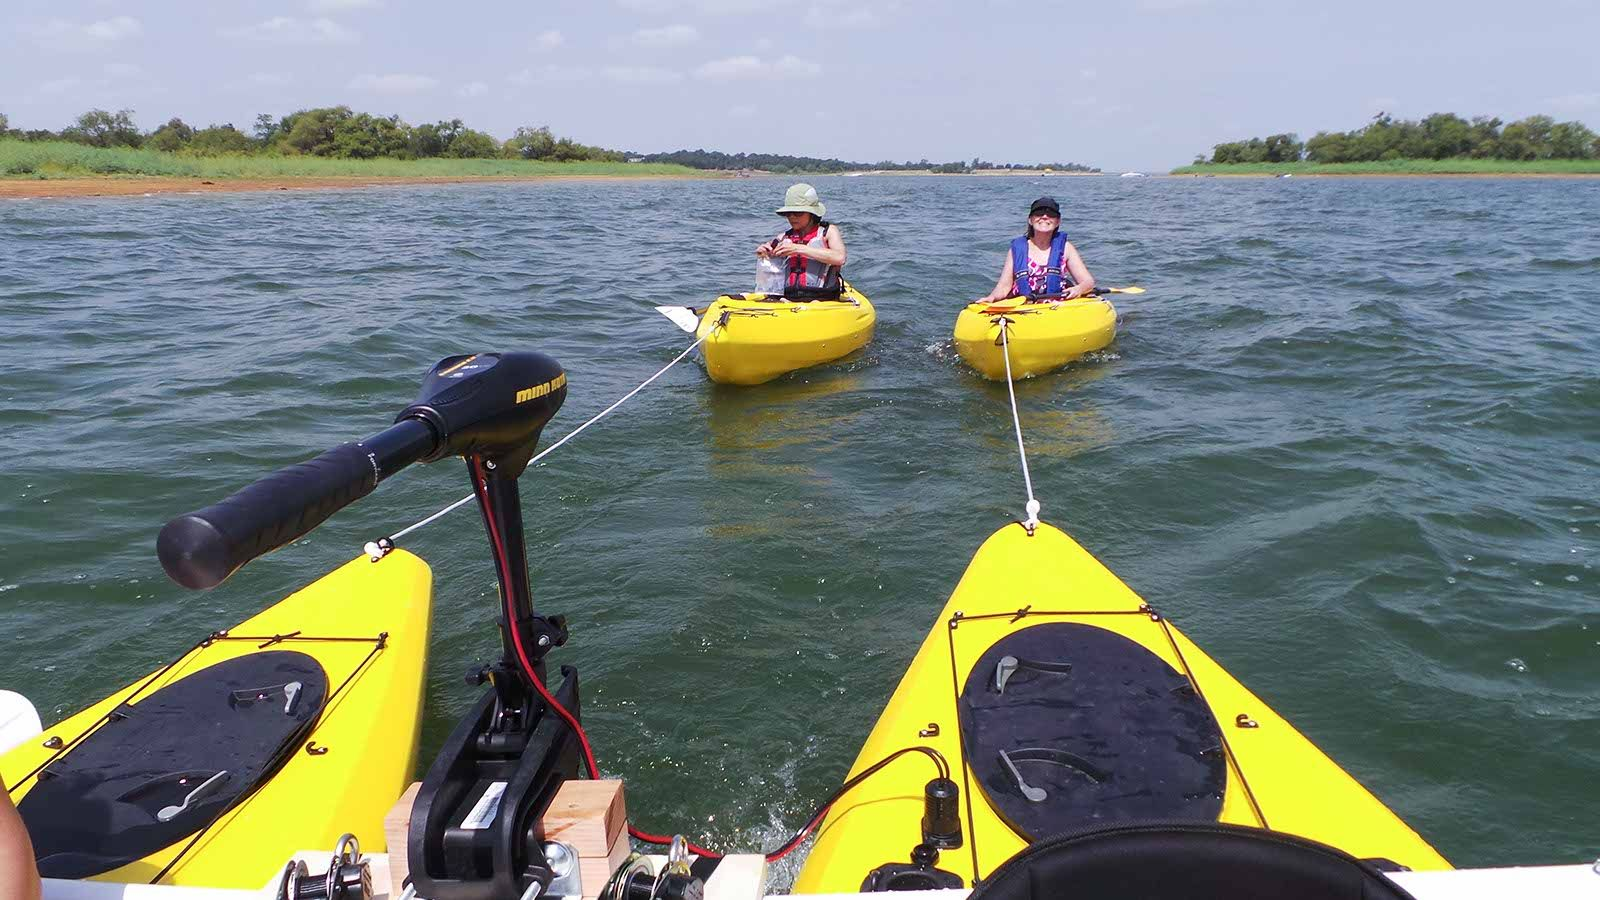 Rafting on Chusovaya on kayaks and catamarans: route, reviews 13